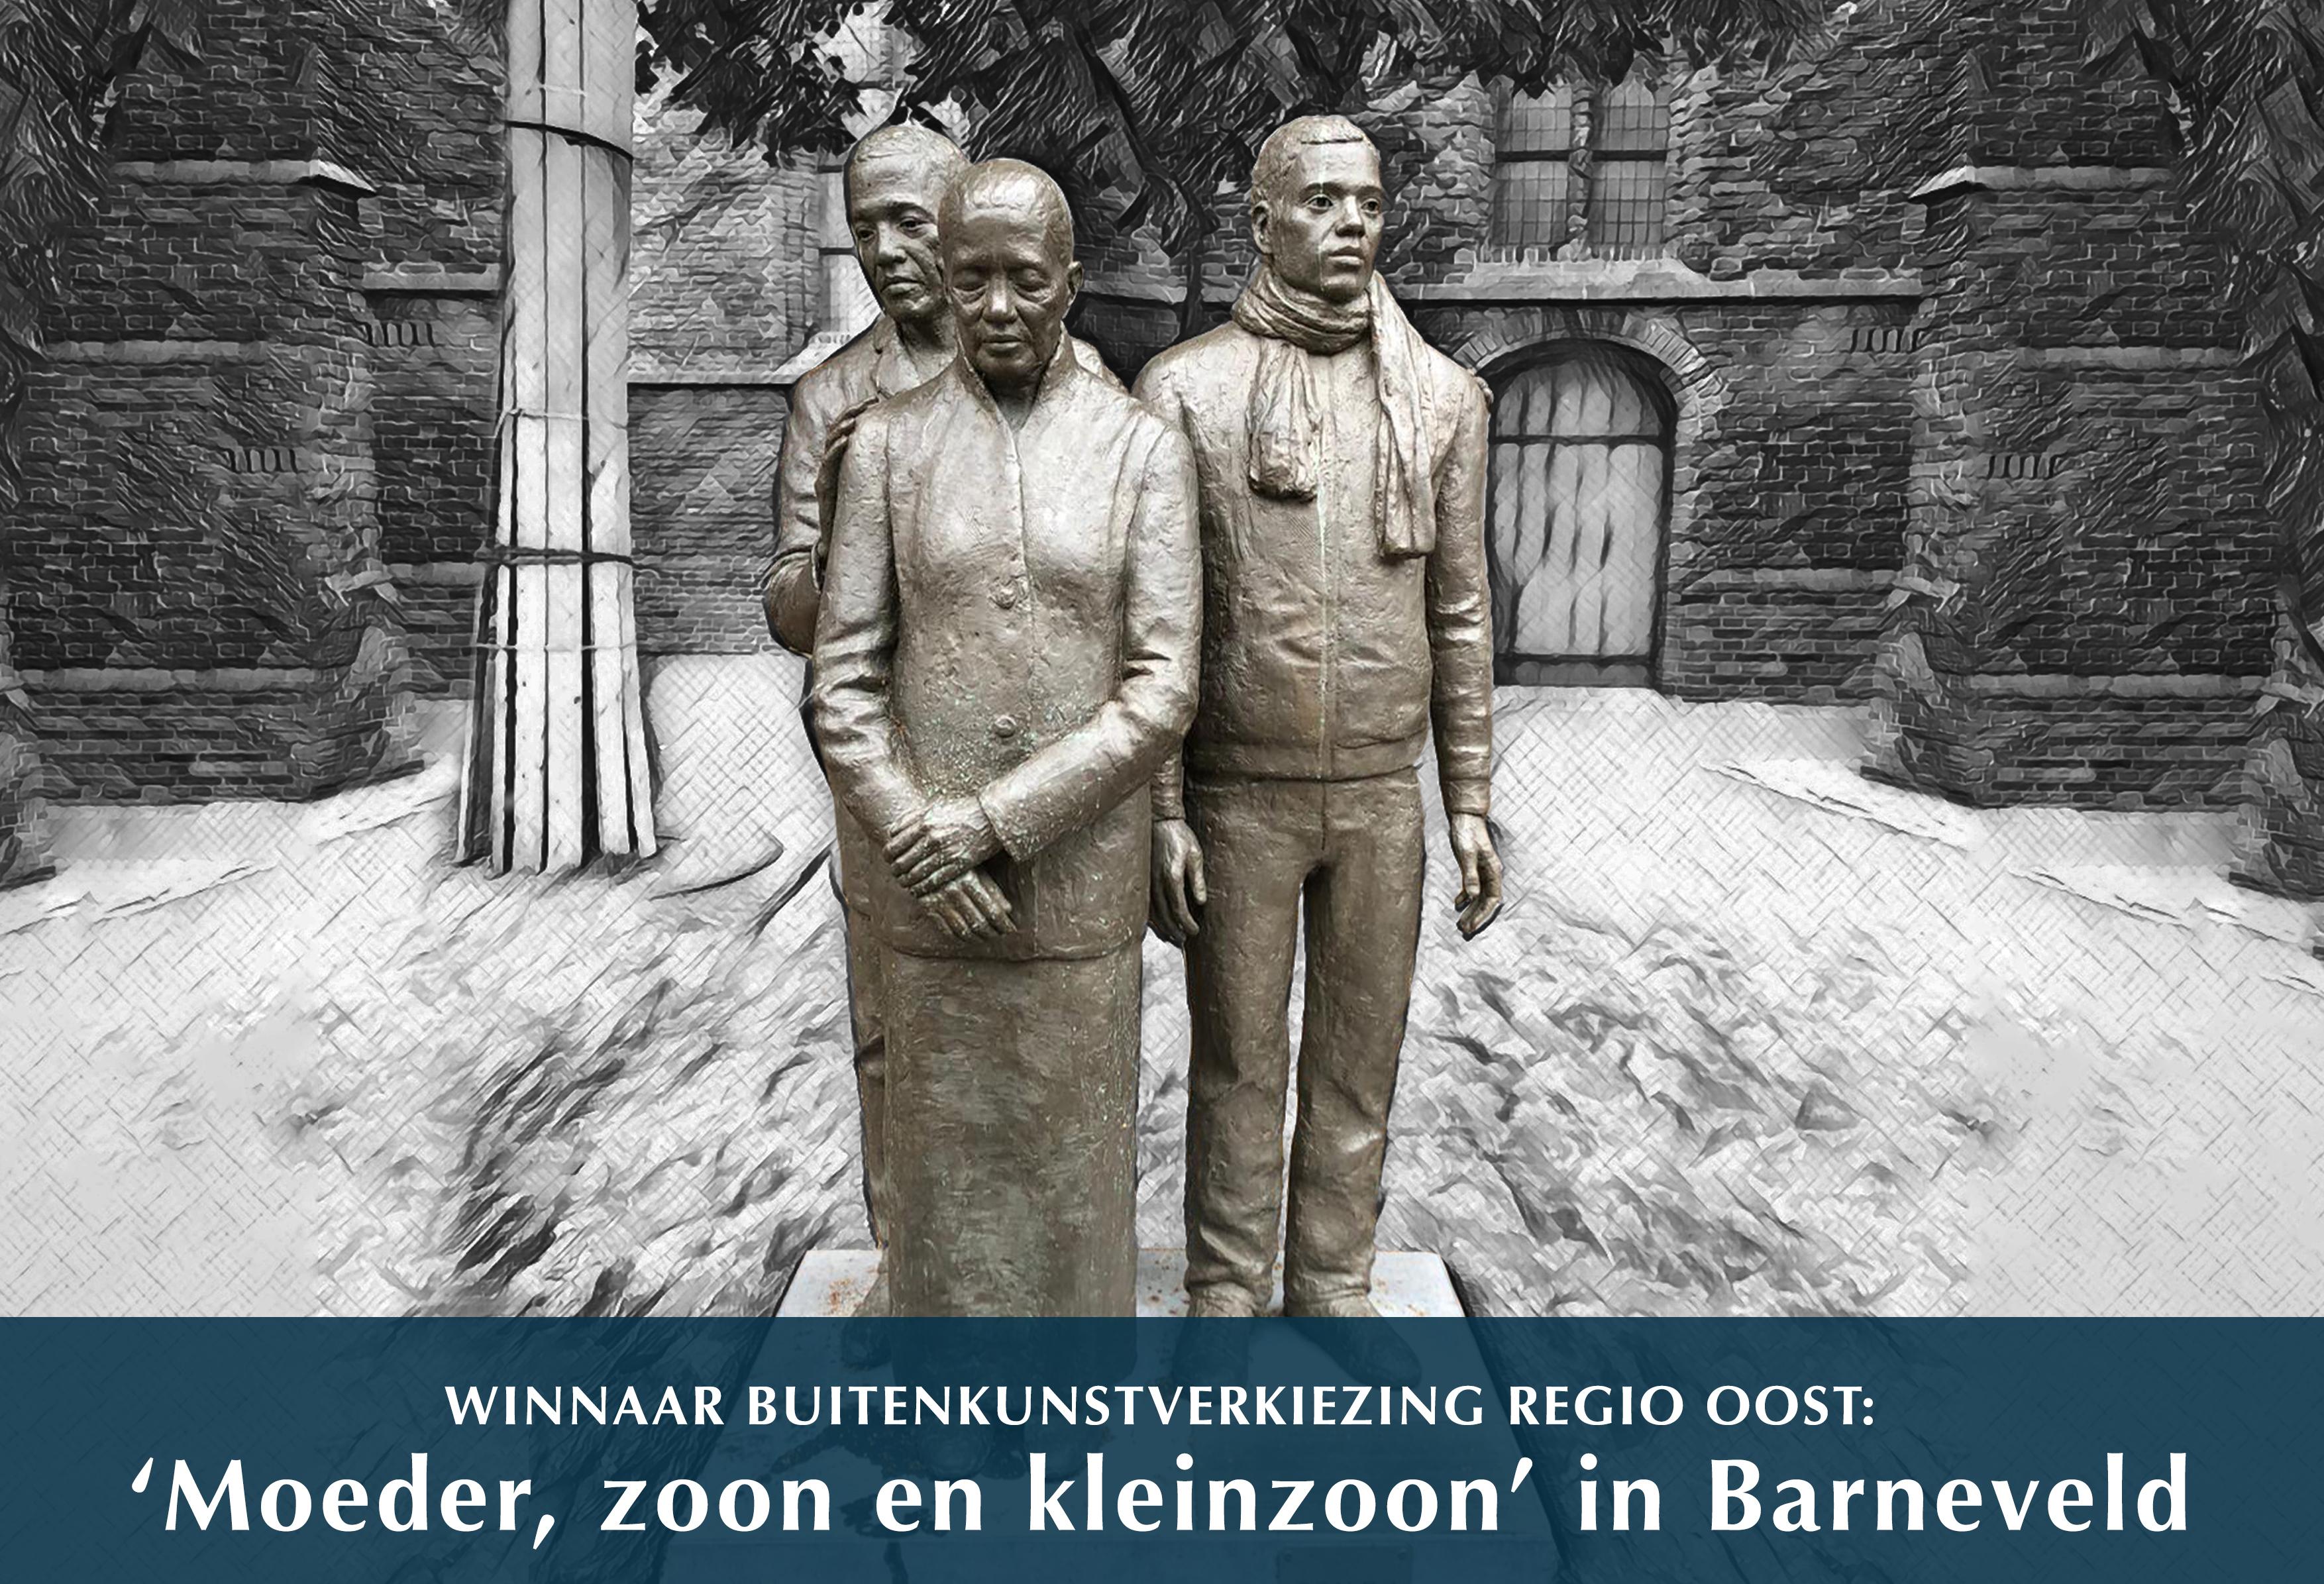 Winnaar buitenkunstverkiezing Regio Oost 'Moeder, zoon en kleinzoon' in Barneveld